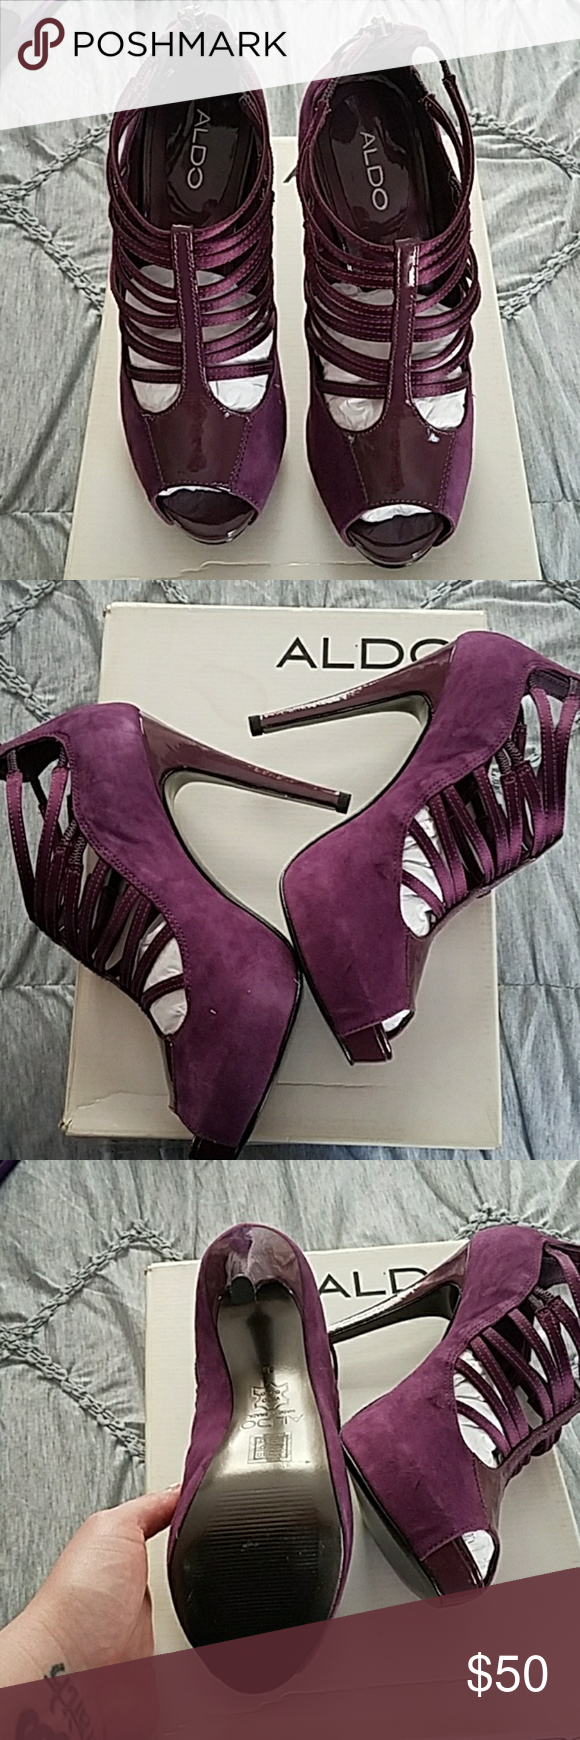 d09ff3ffcc5 Purple strappy booty by aldo Deep purple strappy booty by aldo. 5 inch heel  with